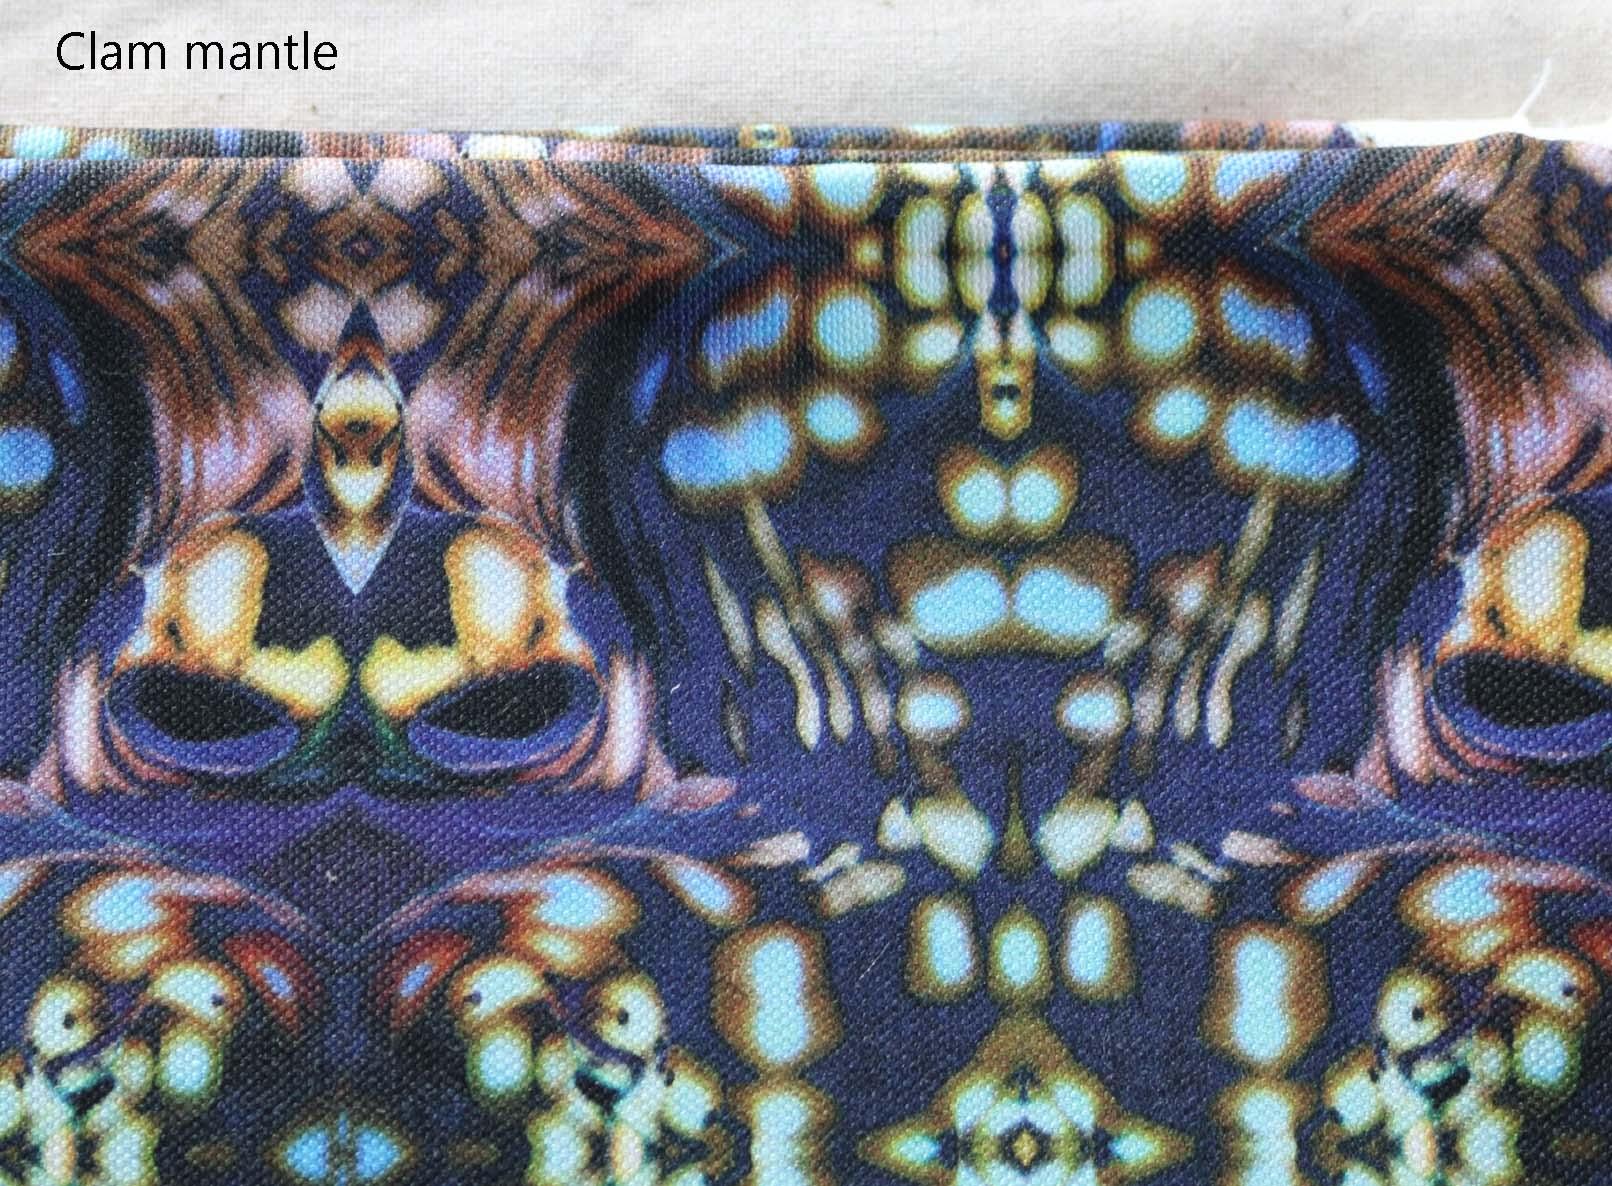 fabric clam.jpg